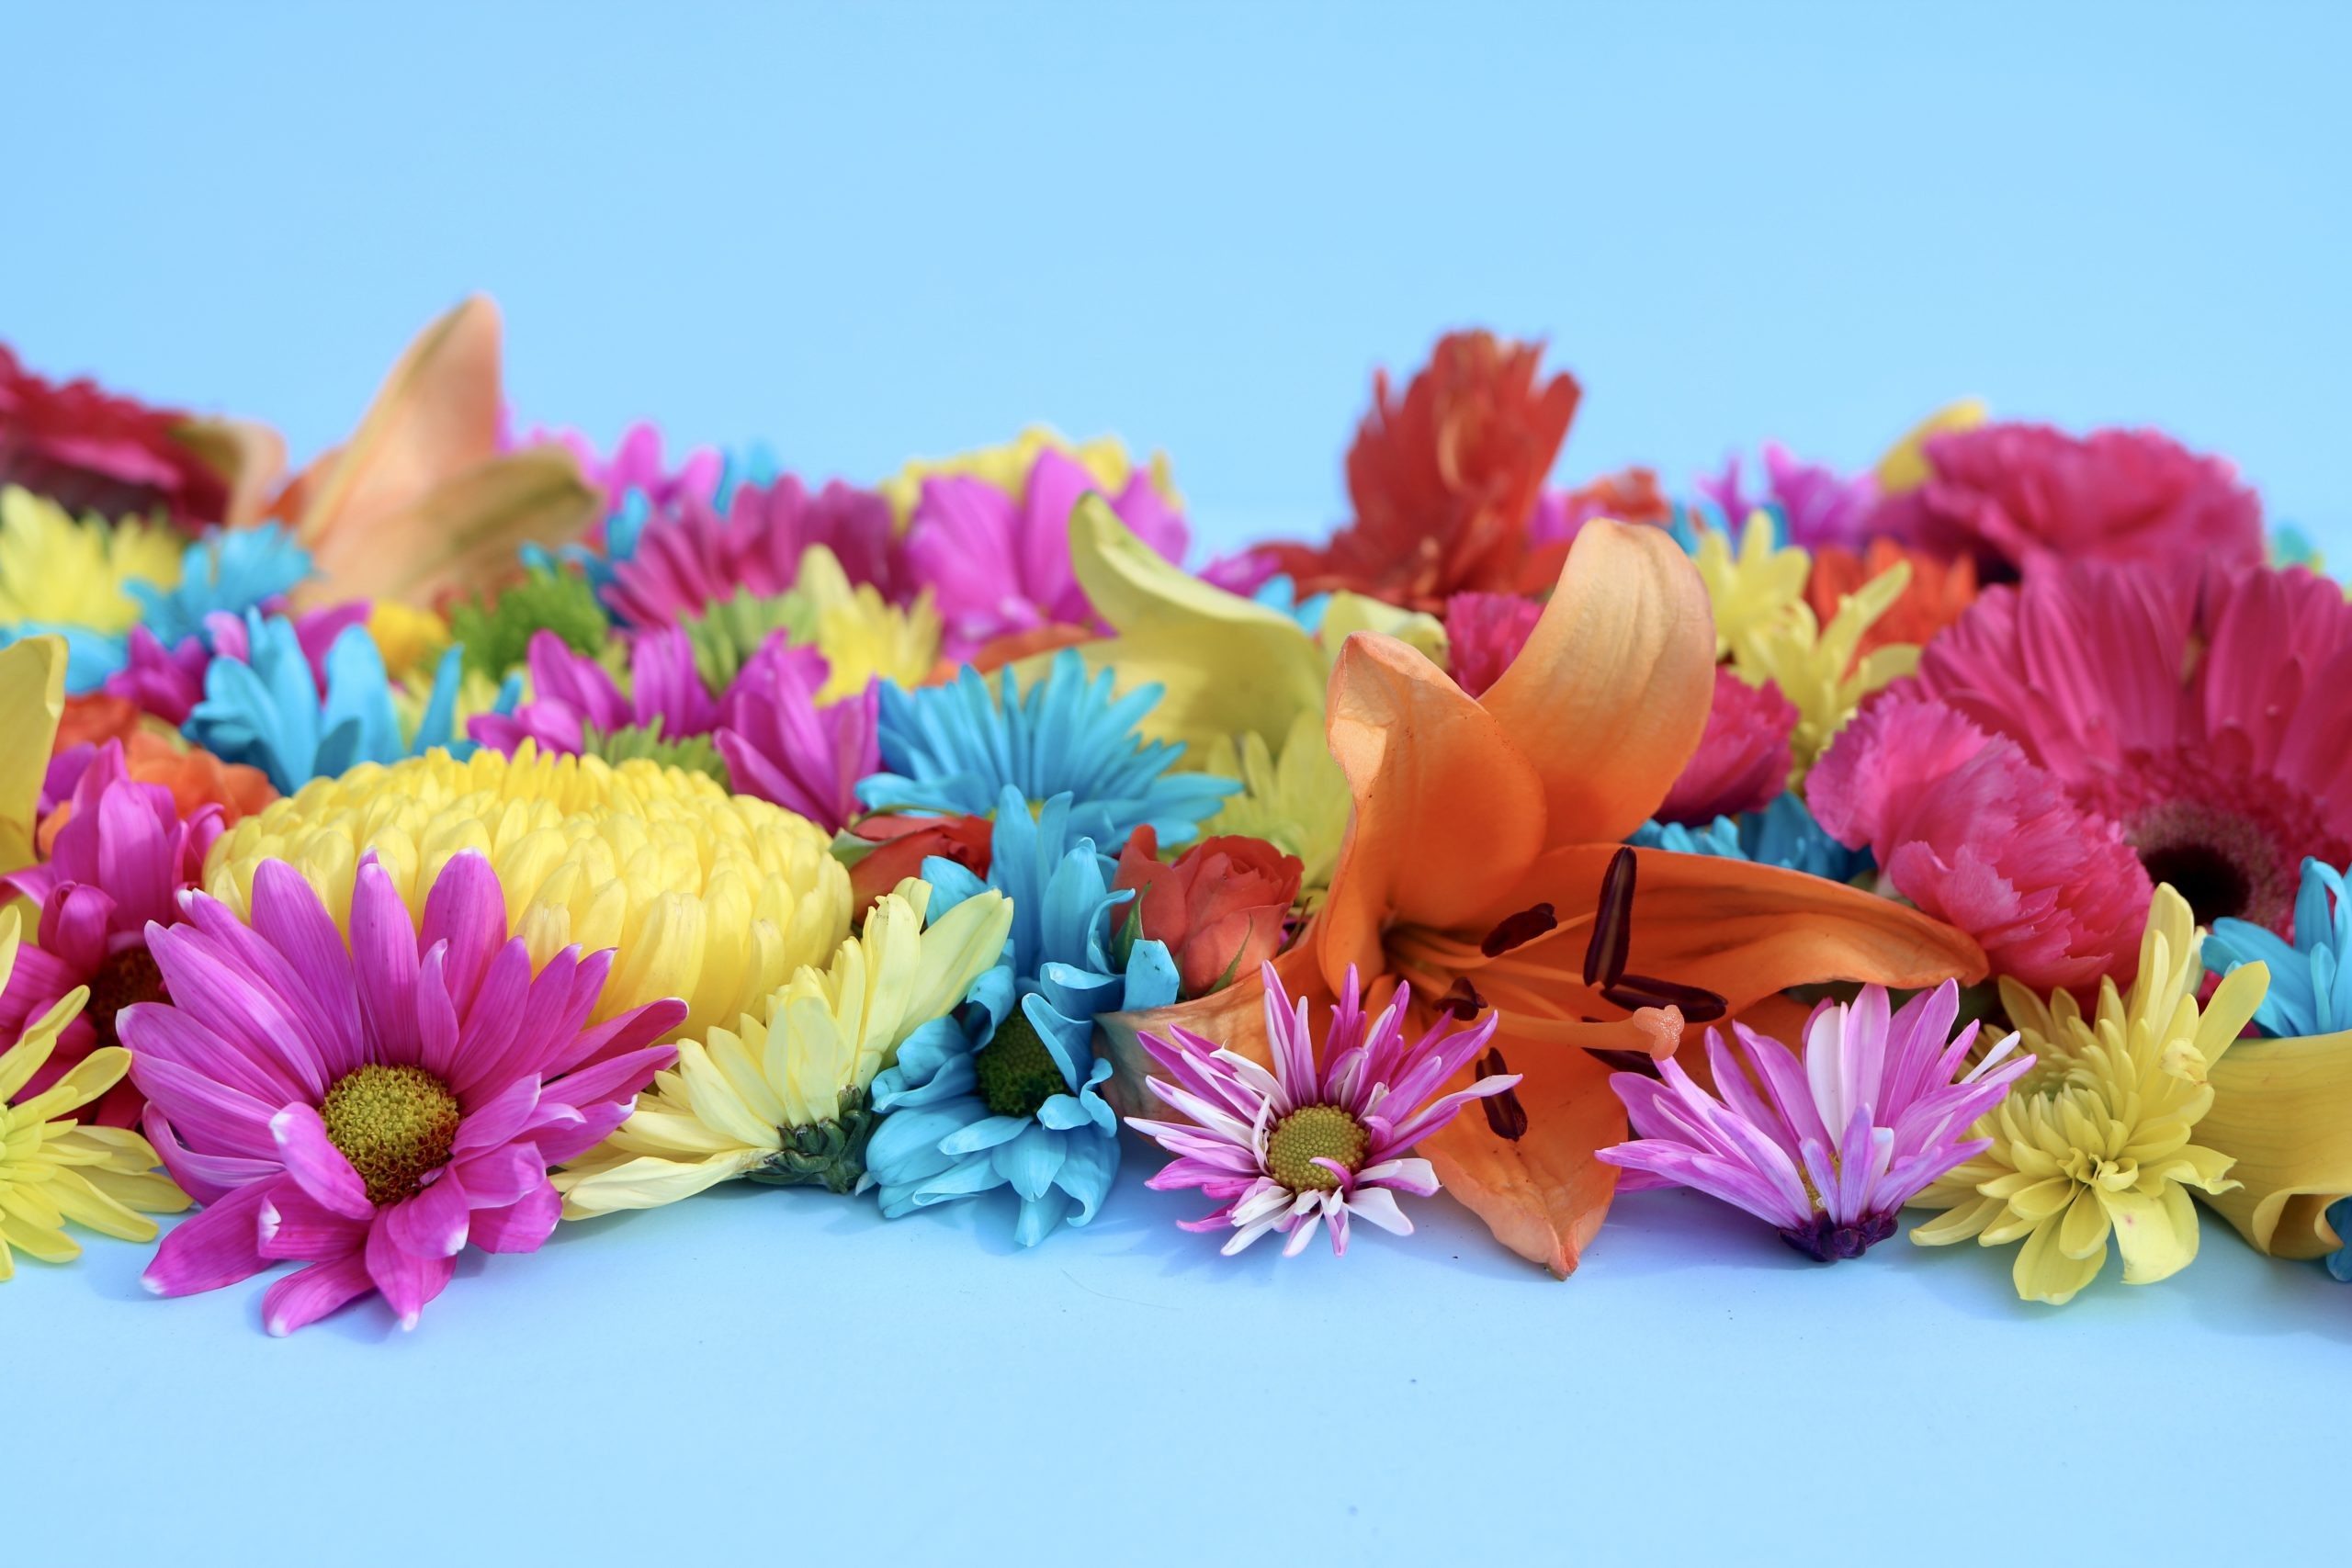 isolation flowers